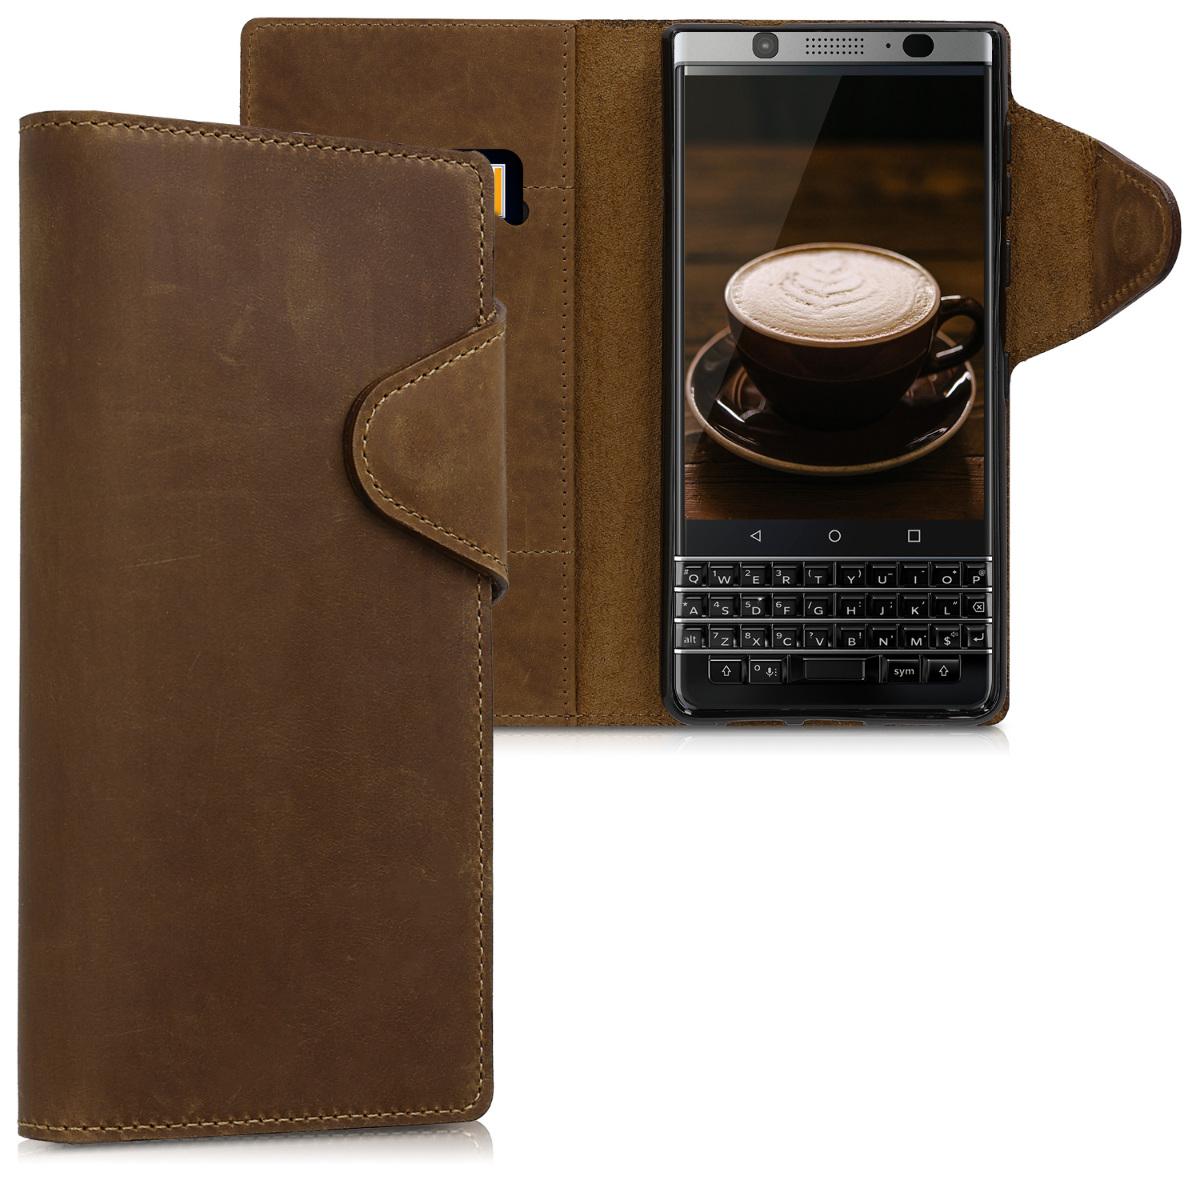 Kalibri Δερμάτινη Suede Θήκη - Πορτοφόλι Blackberry KEYone - Brown (45166.05)